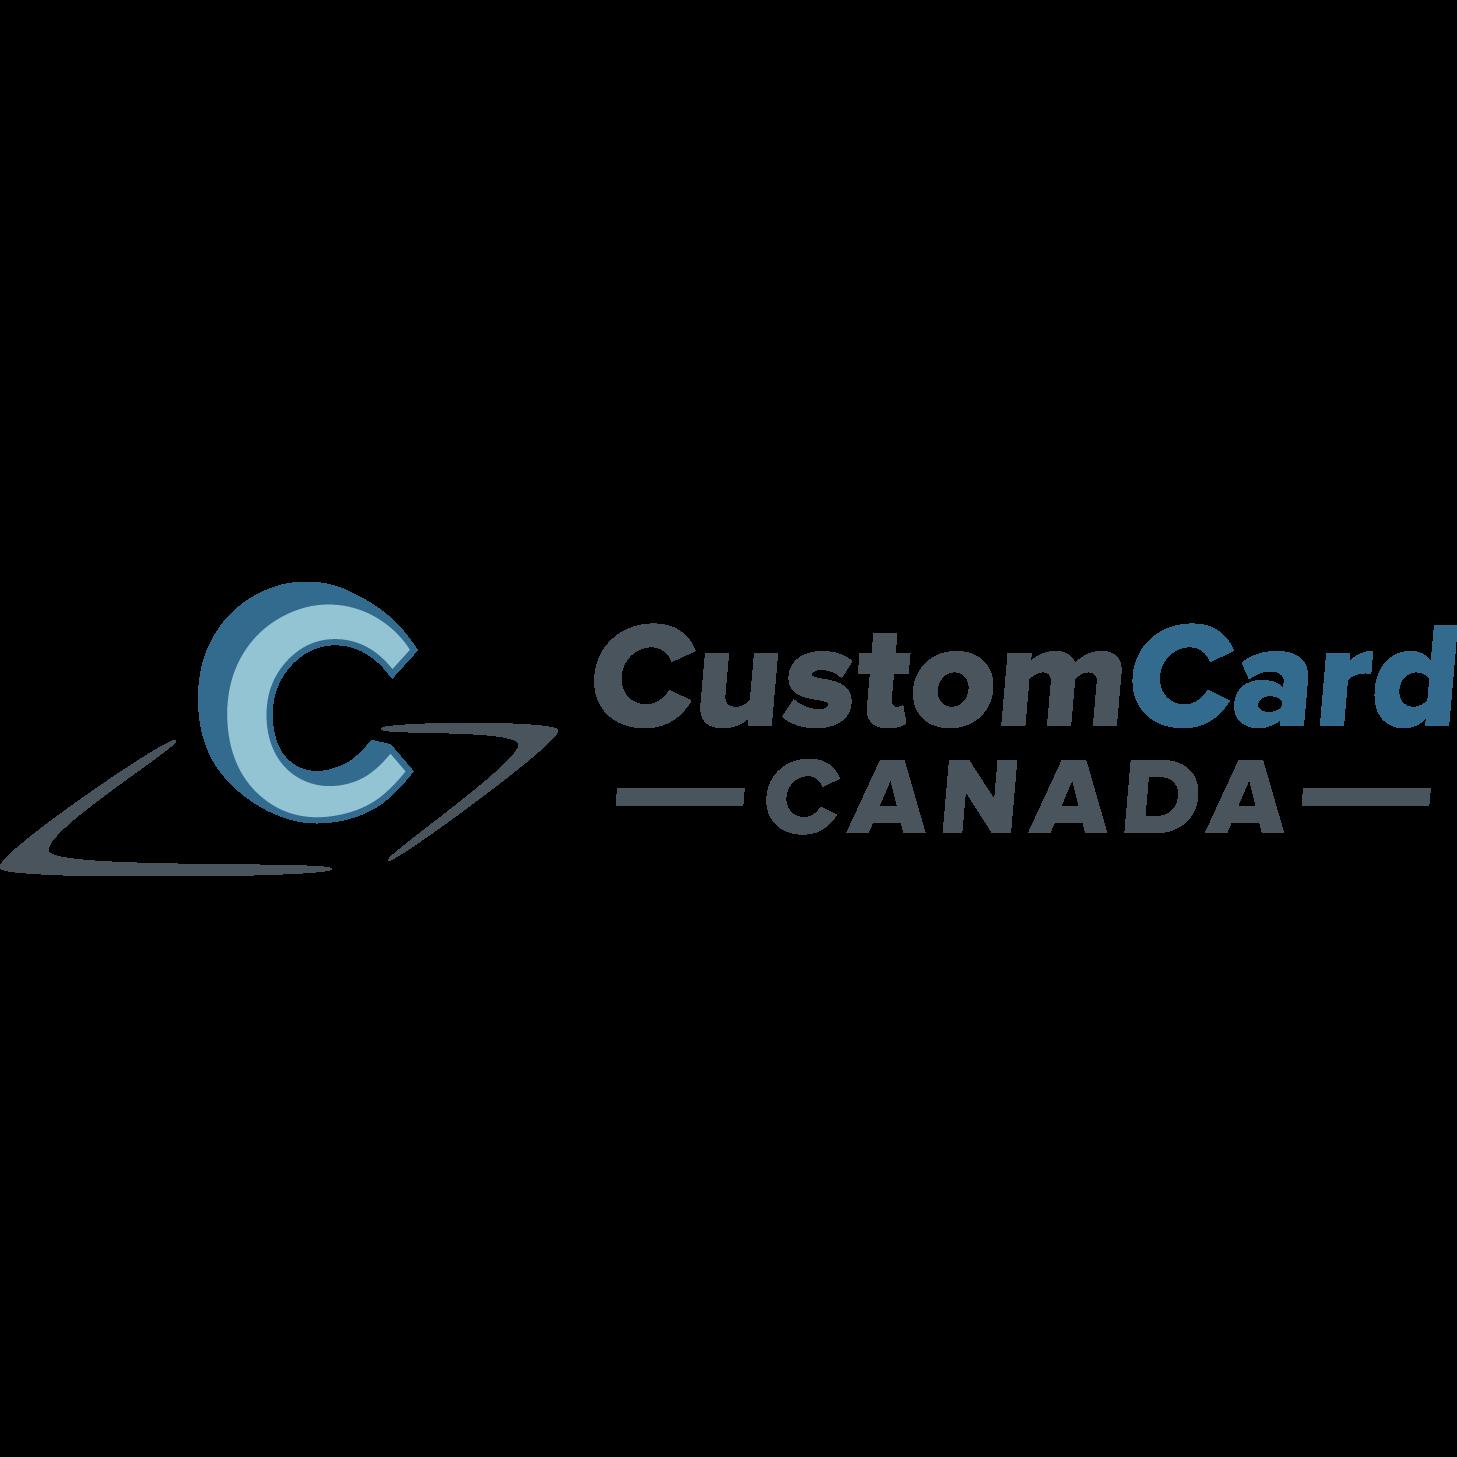 Custom Card Canada